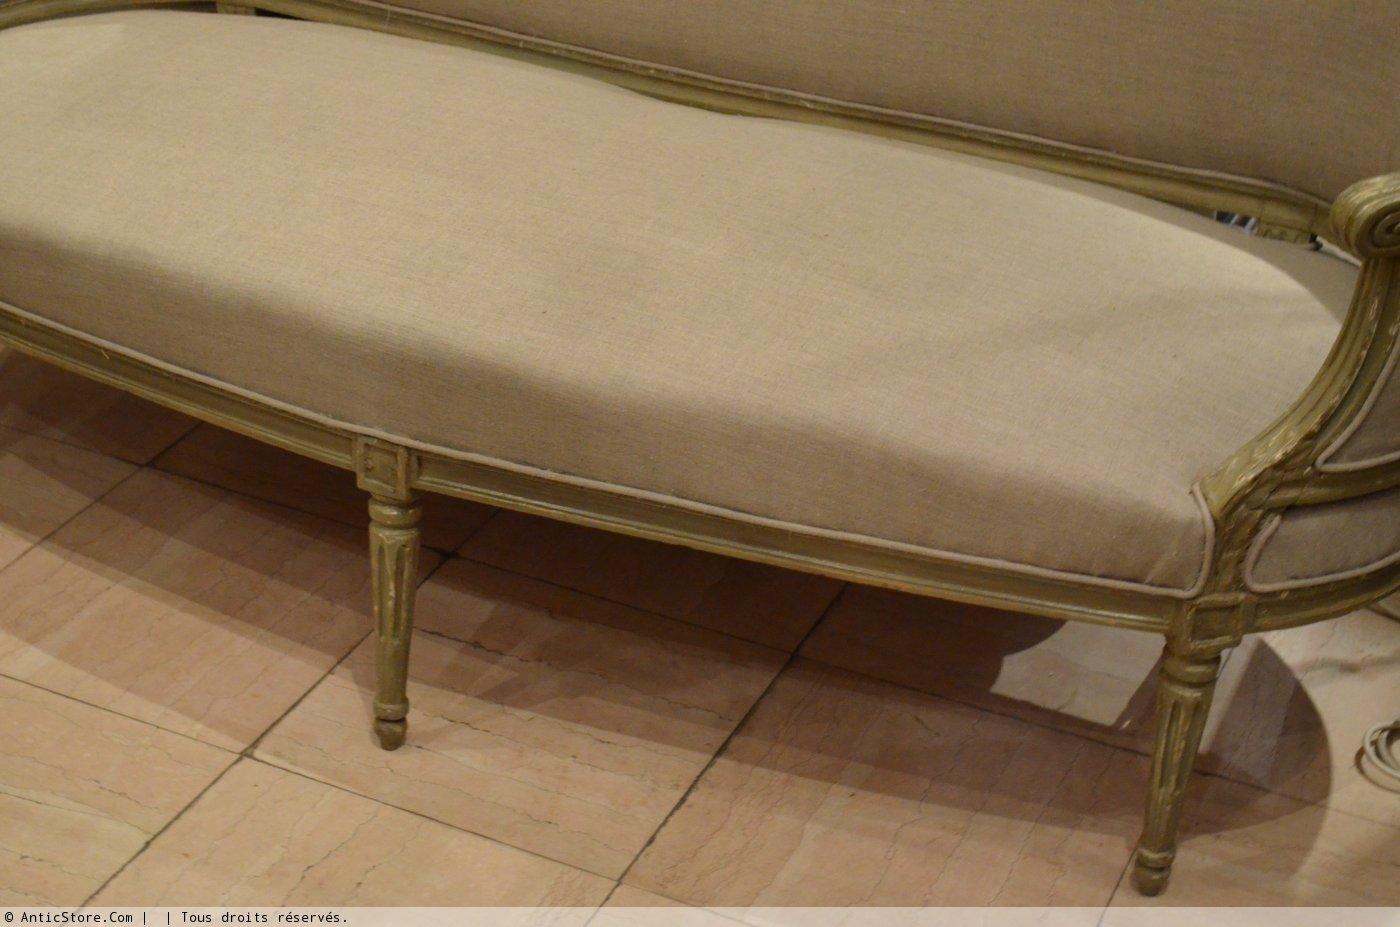 canap corbeille d 39 poque louis xvi xviiie si cle. Black Bedroom Furniture Sets. Home Design Ideas